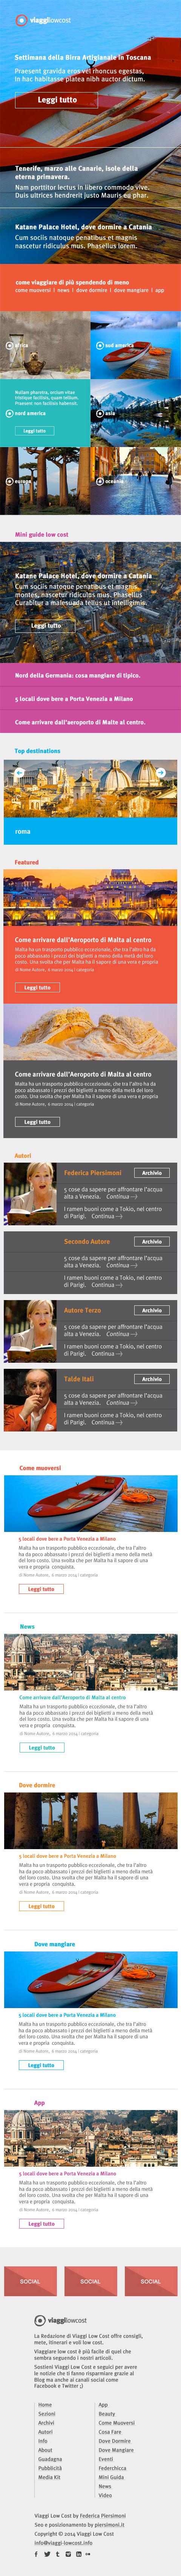 viaggi-lowcost.info homepage page layout